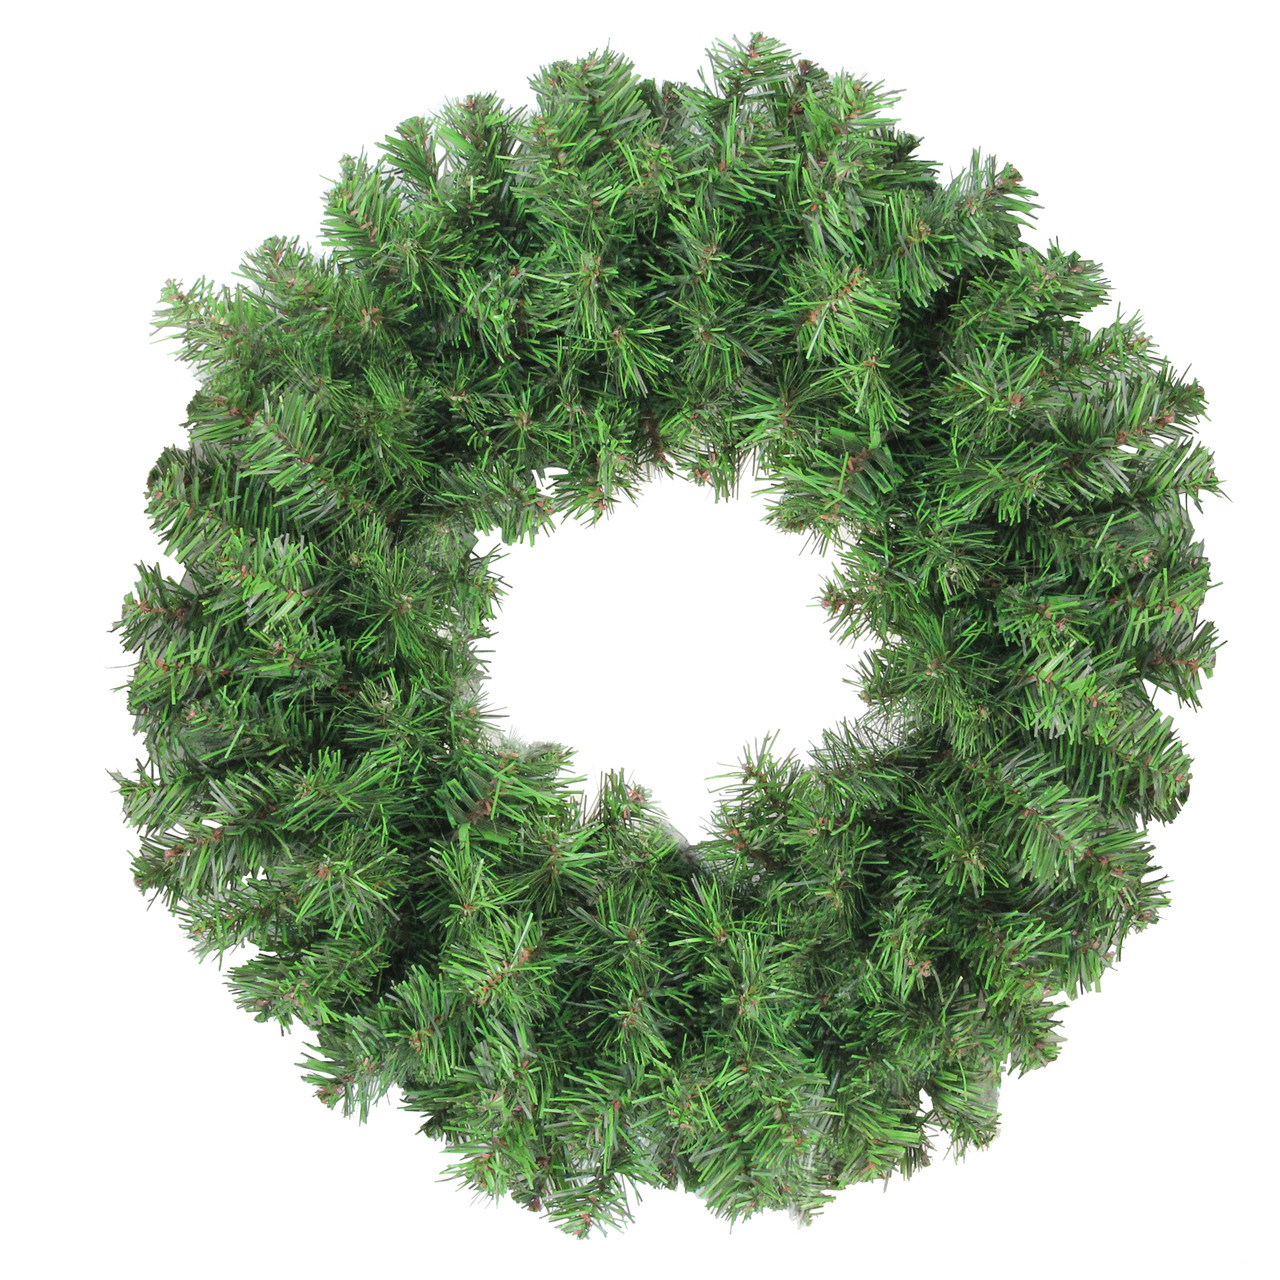 16 colorado spruce 2 tone artificial christmas wreath unlit christmas central - Green Christmas Garland